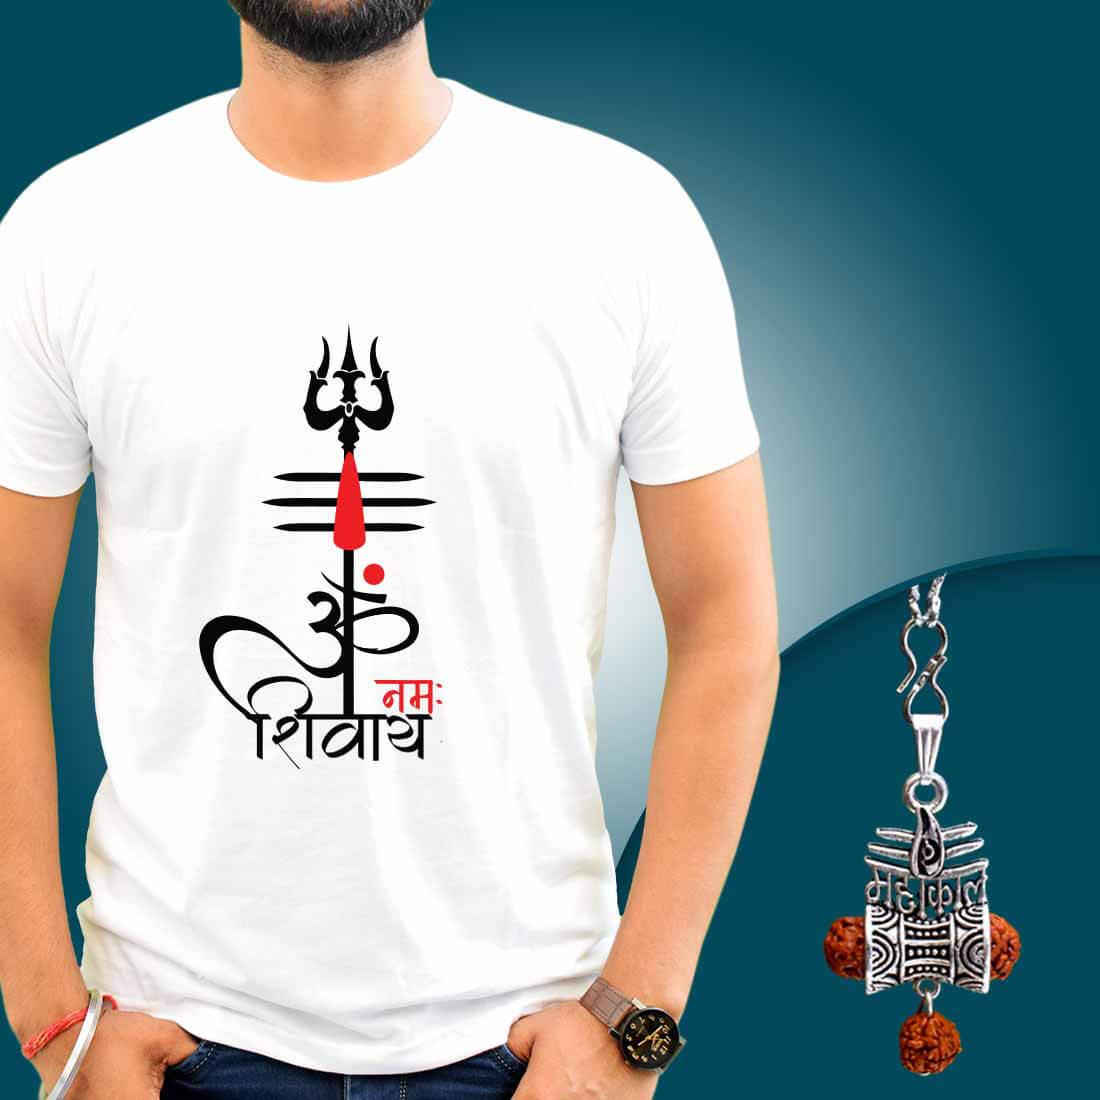 Trishul With Om Printed T-Shirt Combo With Mahakal Locket